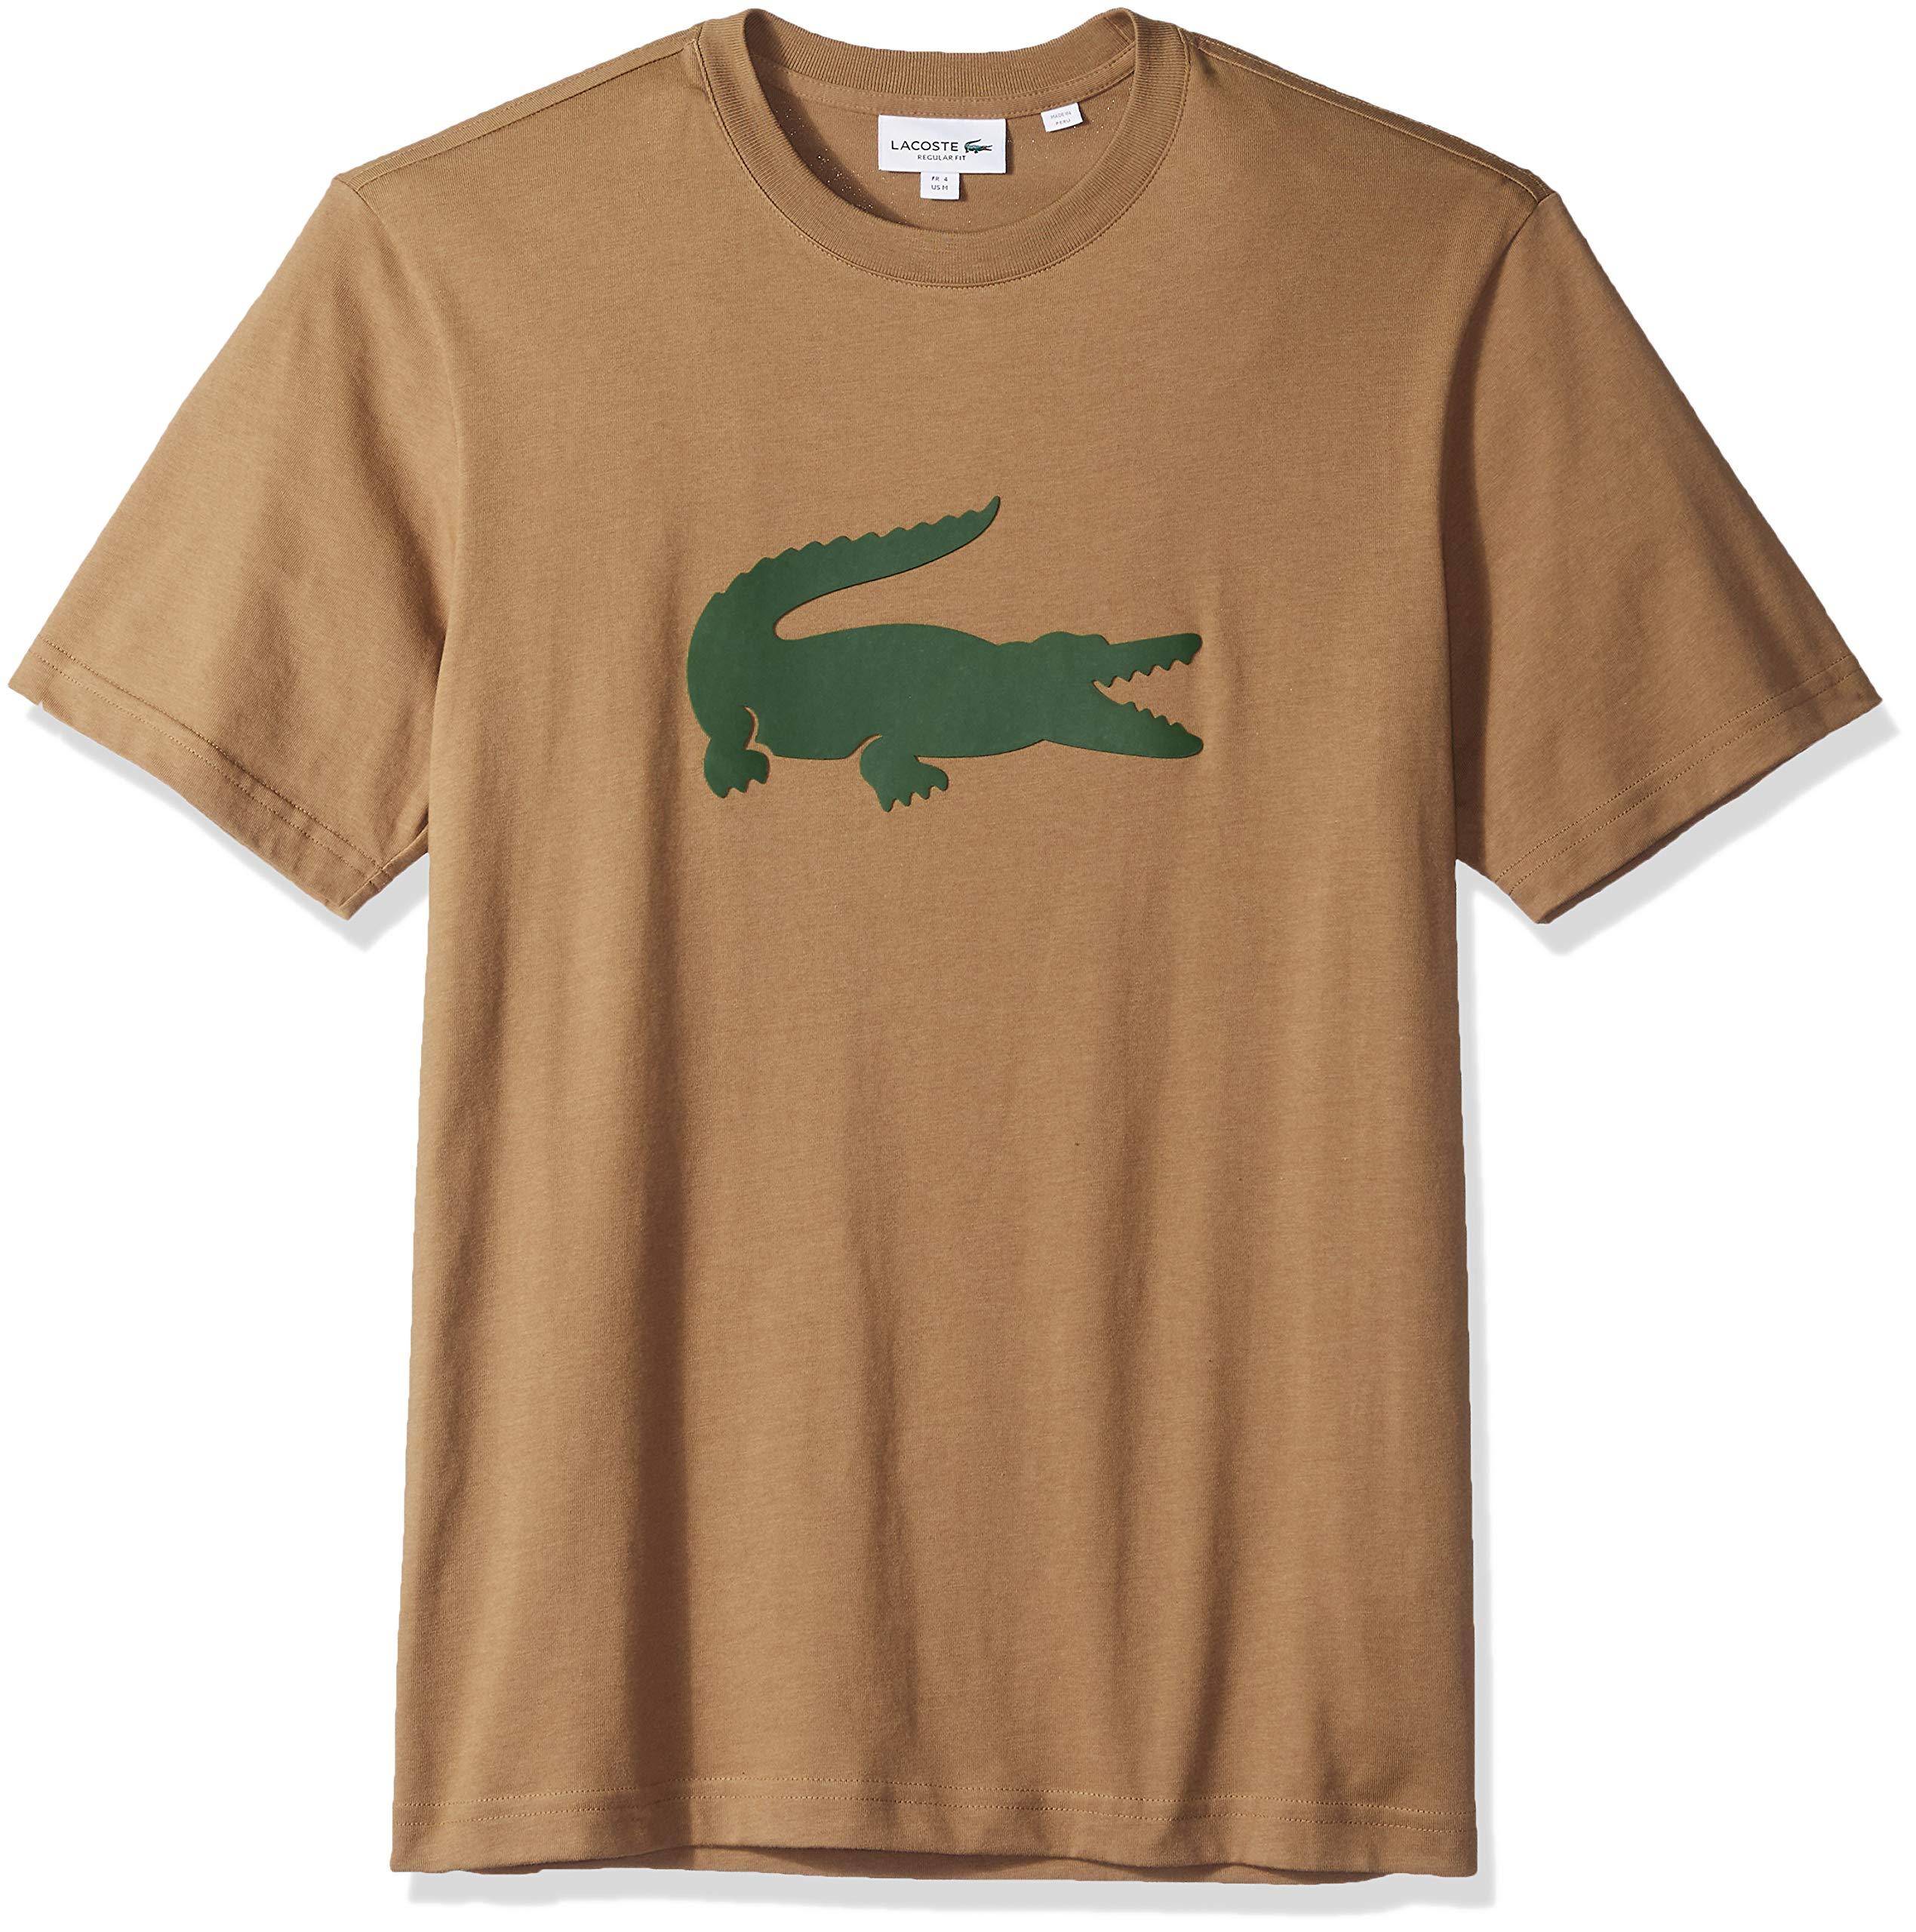 fc68a16b Galleon - Lacoste Men's Crew Neck Oversized Crocodile Cotton Jersey T-Shirt,  Dark Kraft/Green, 4X-Large